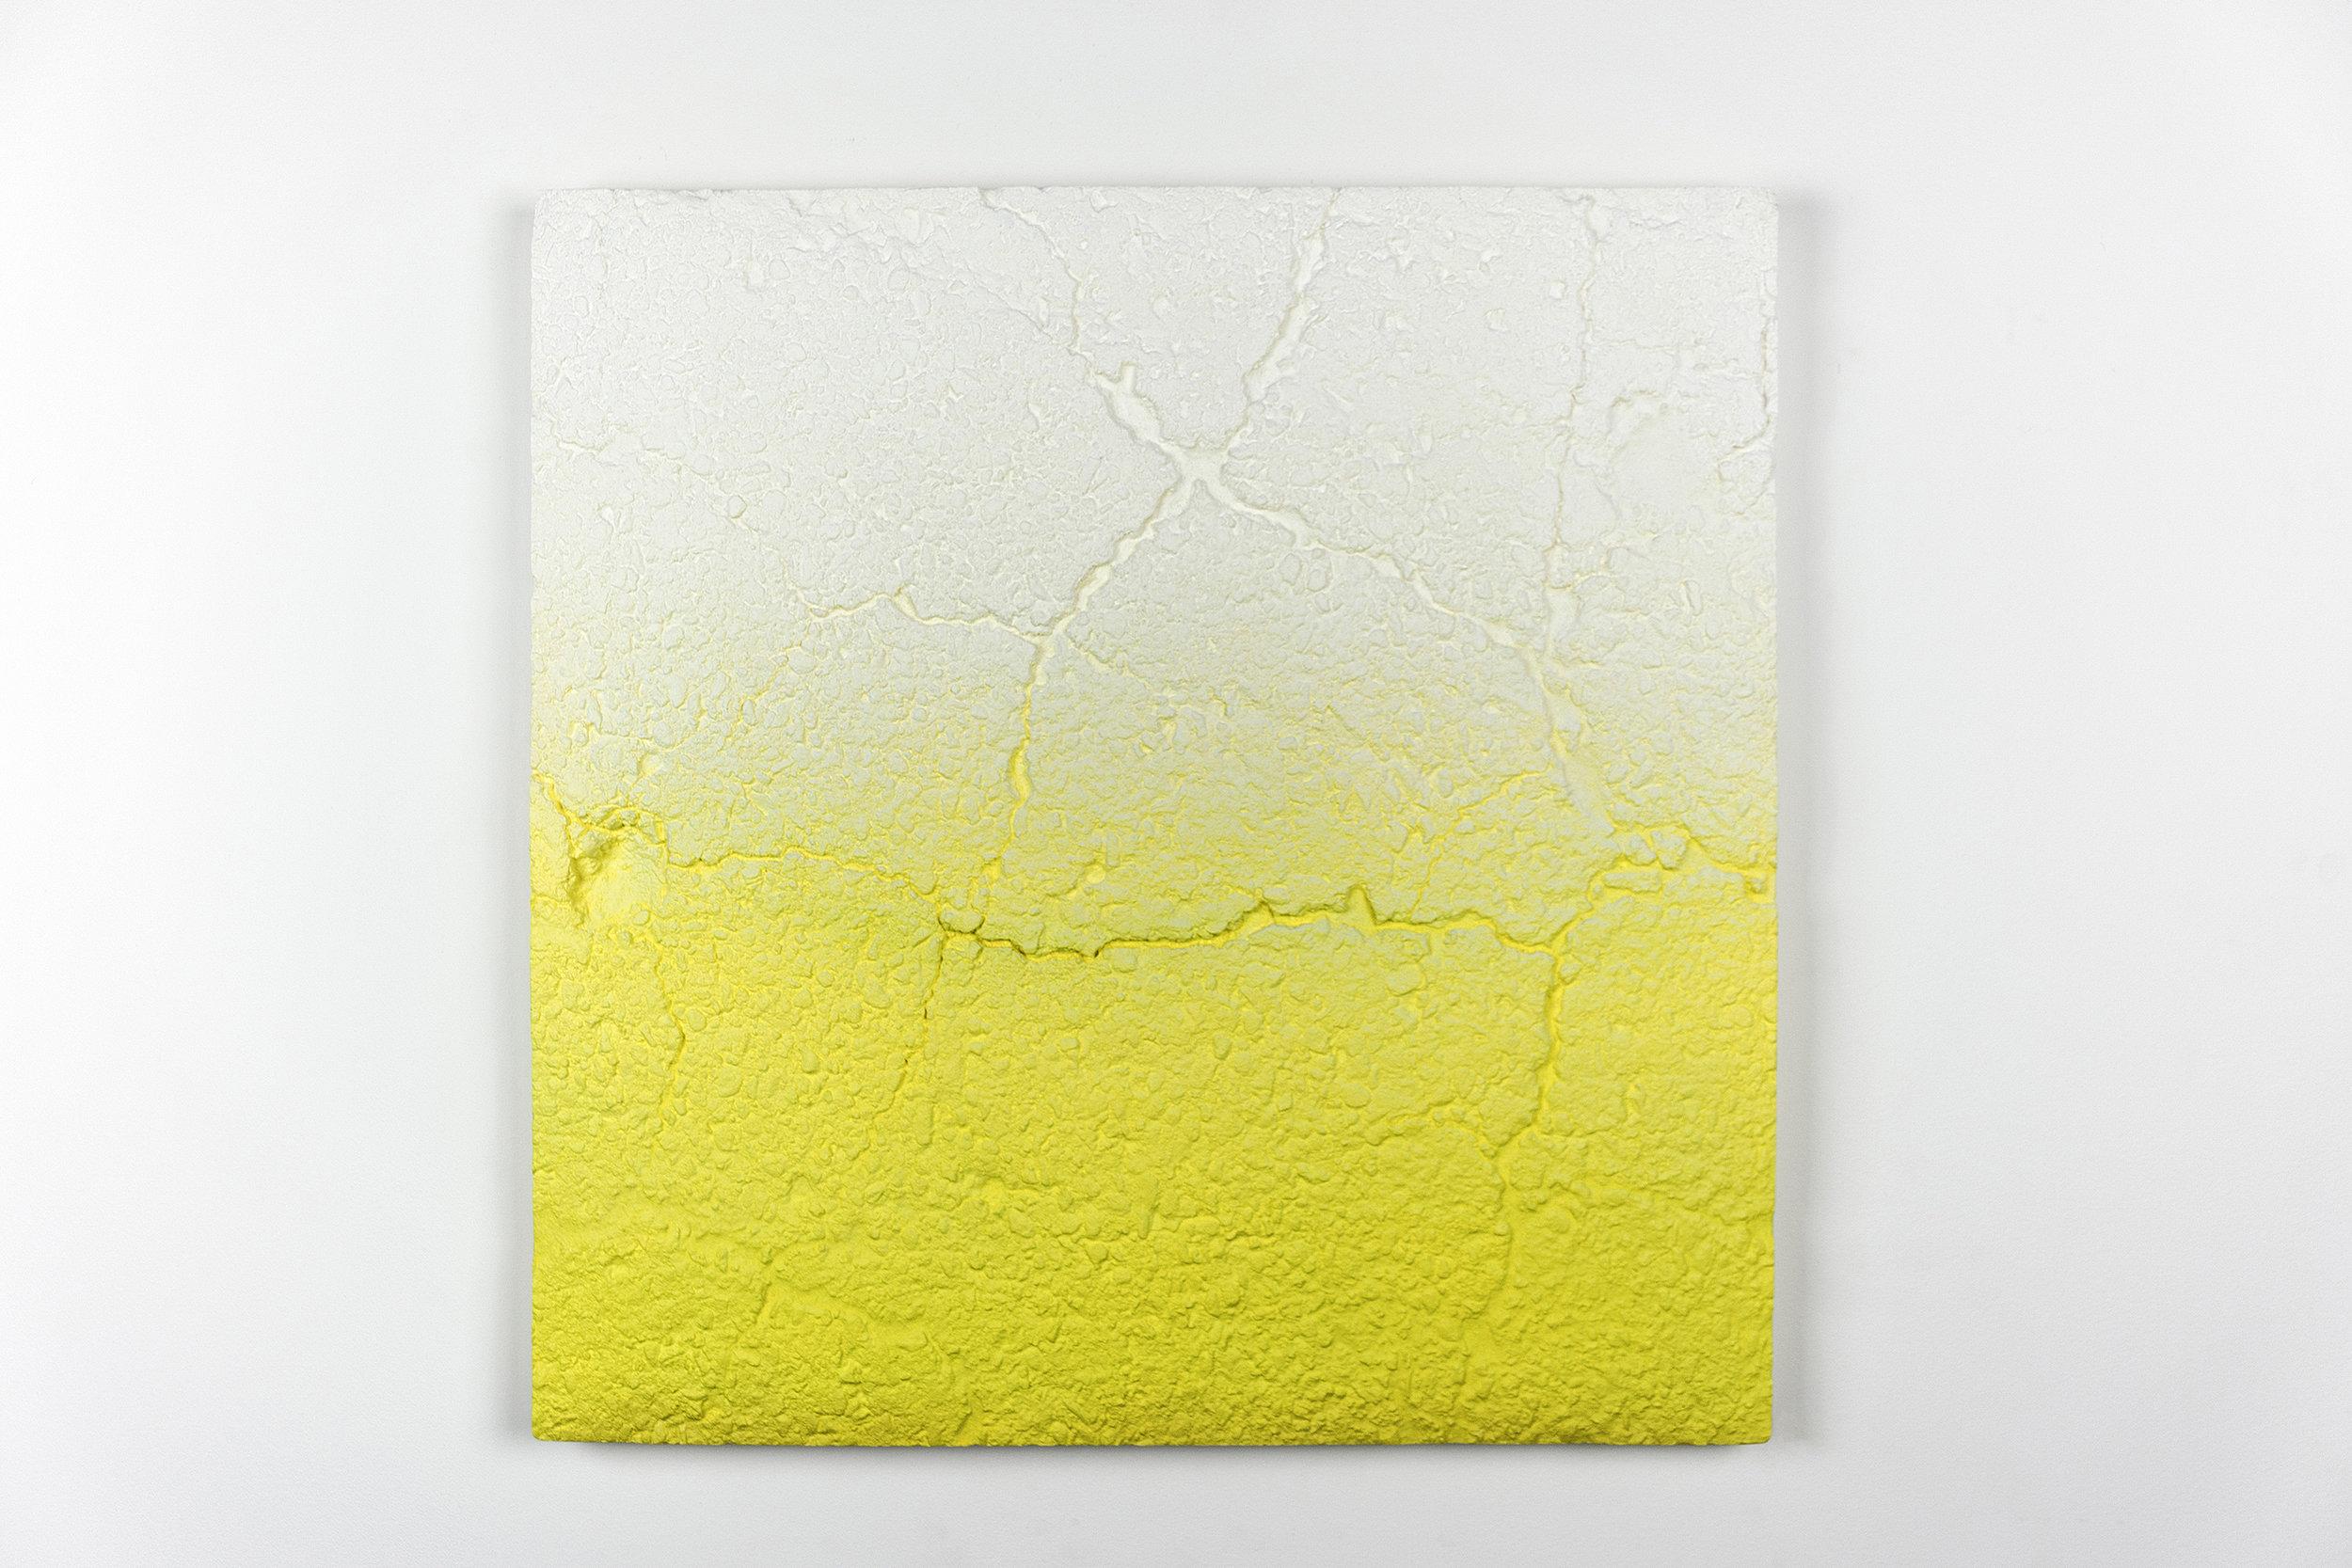 New Landscape Painting #03 [Sulfuric Horizon]